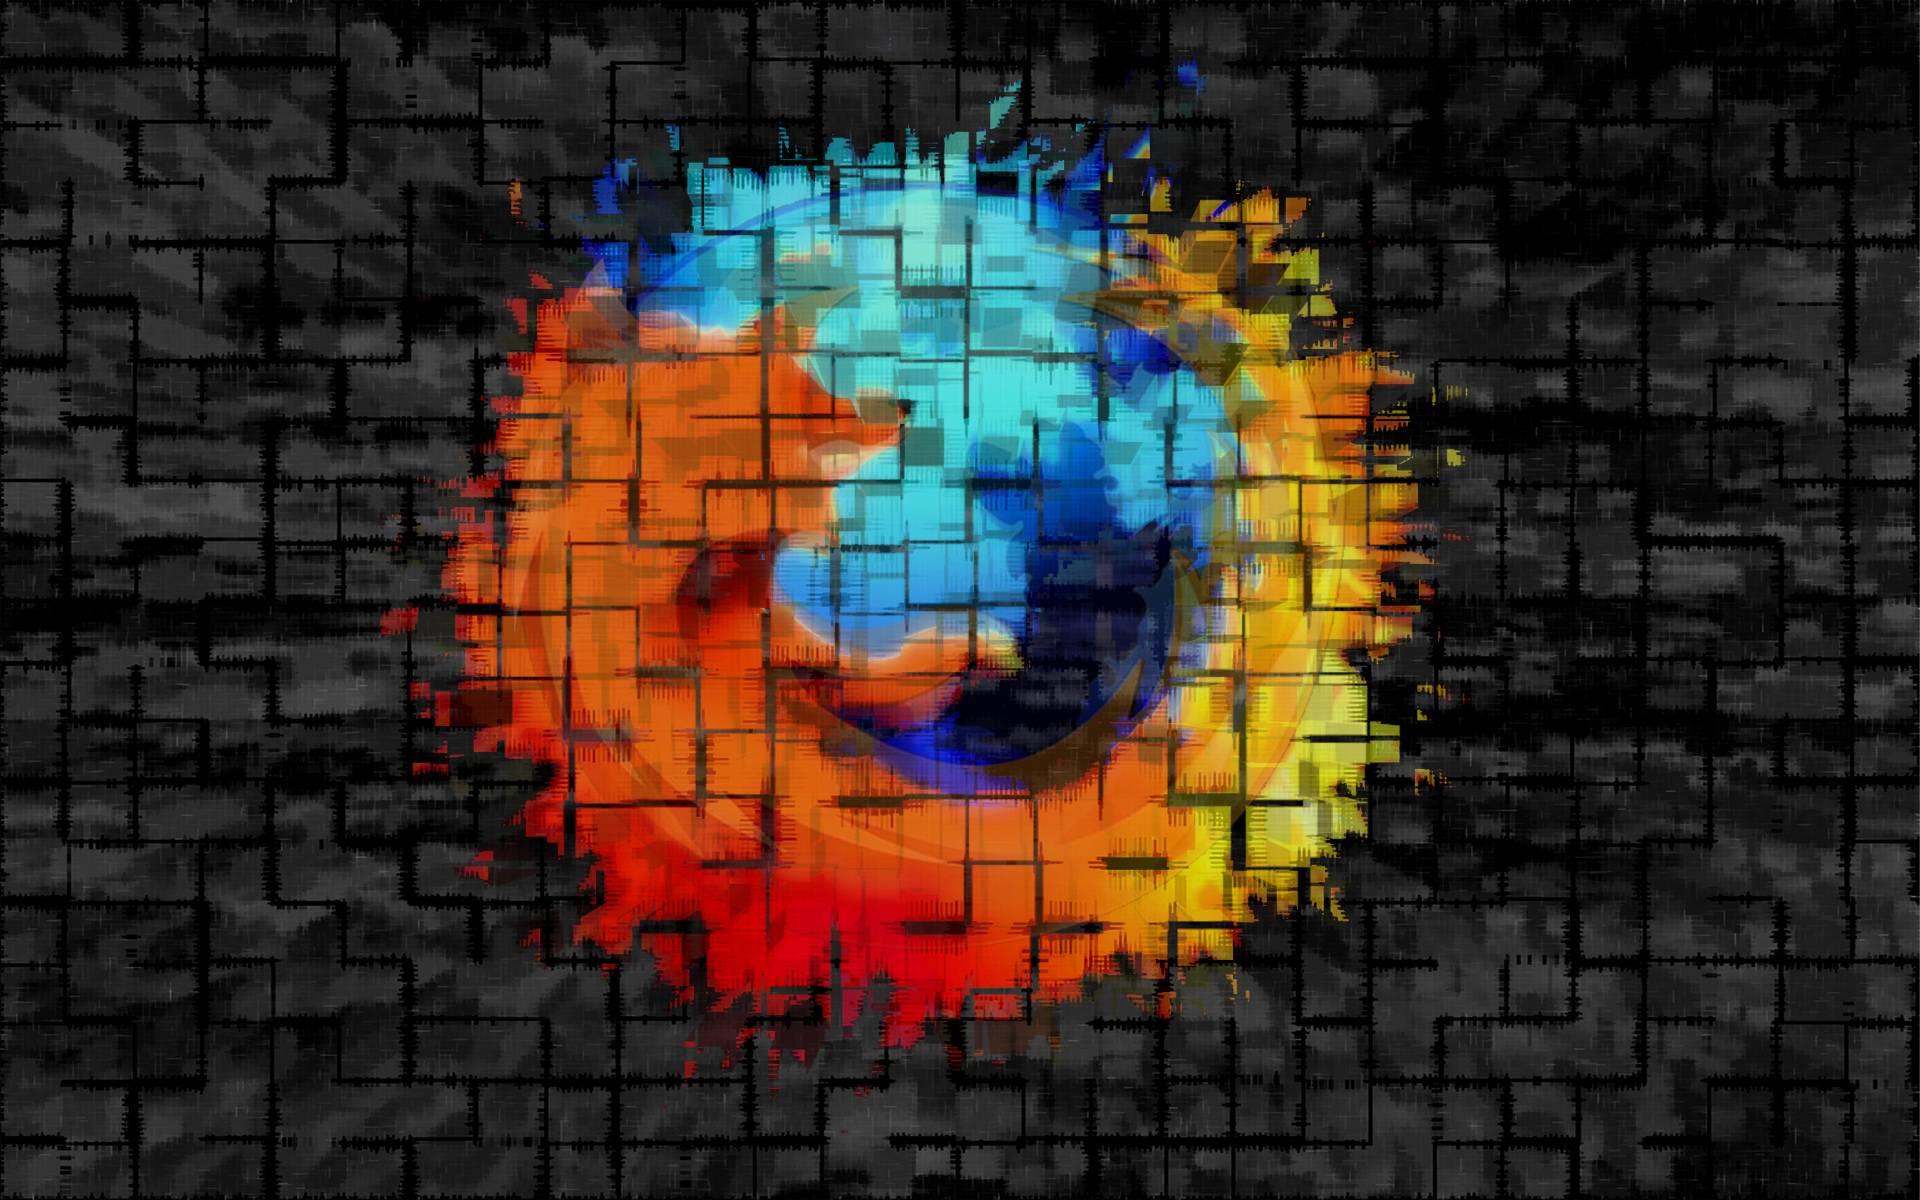 Artsy Wallpaper Desktop Image 1920x1200